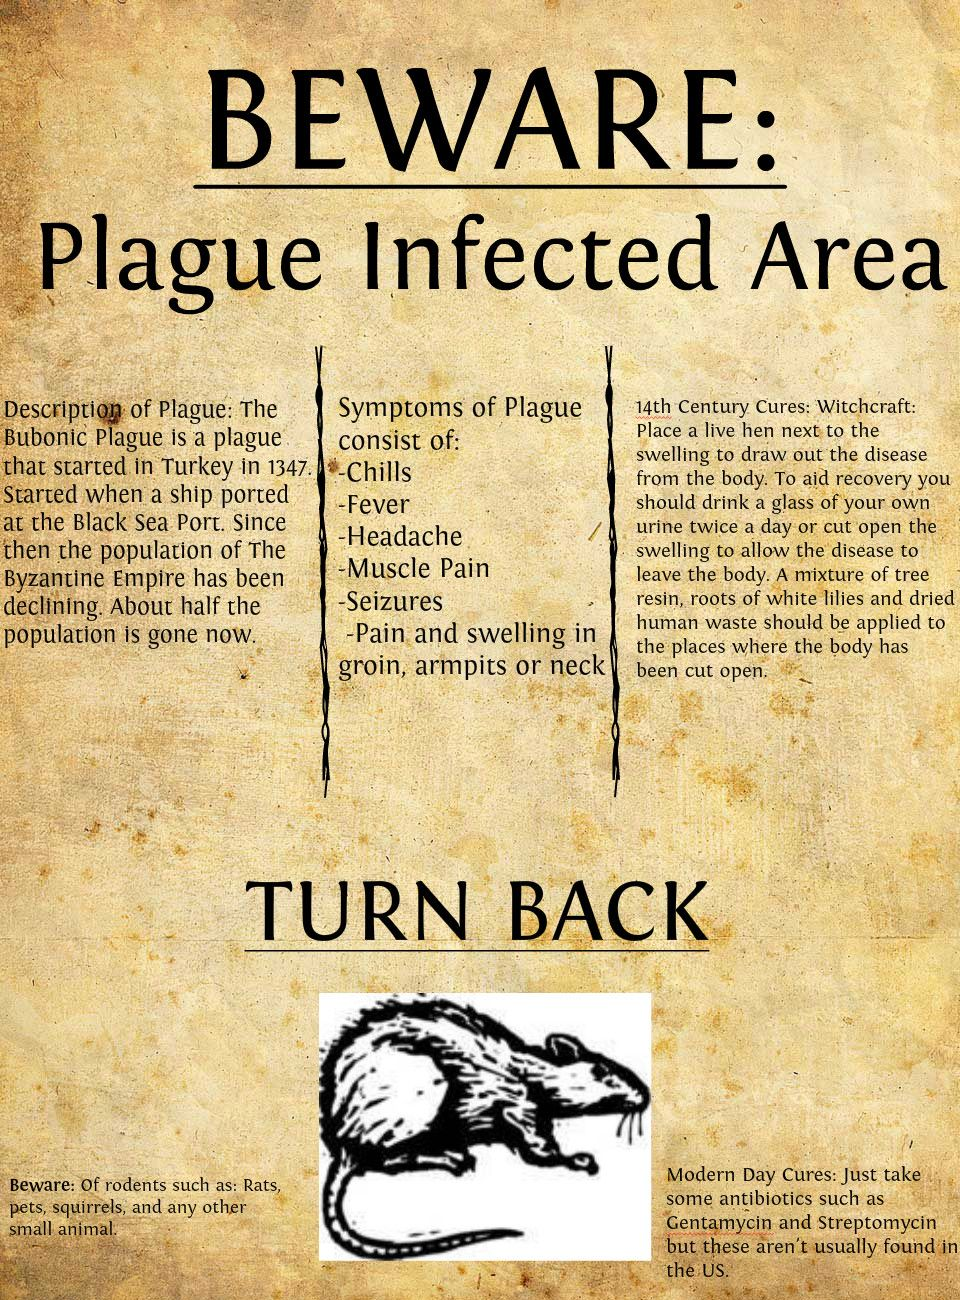 bubonicplaguesource.jpg (960×1300) Bubonic plague